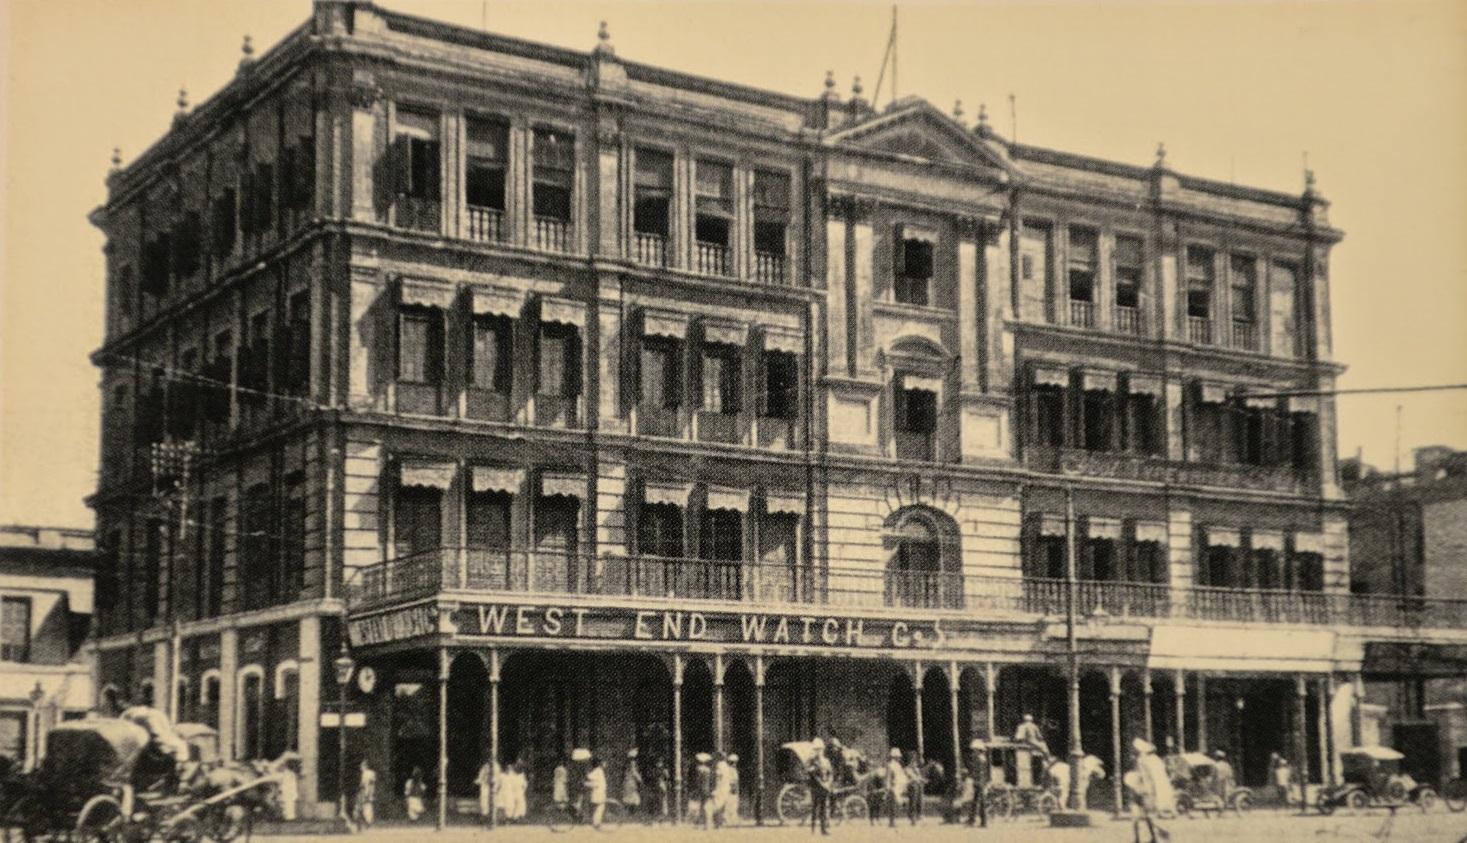 West End Watch Co, Calcutta